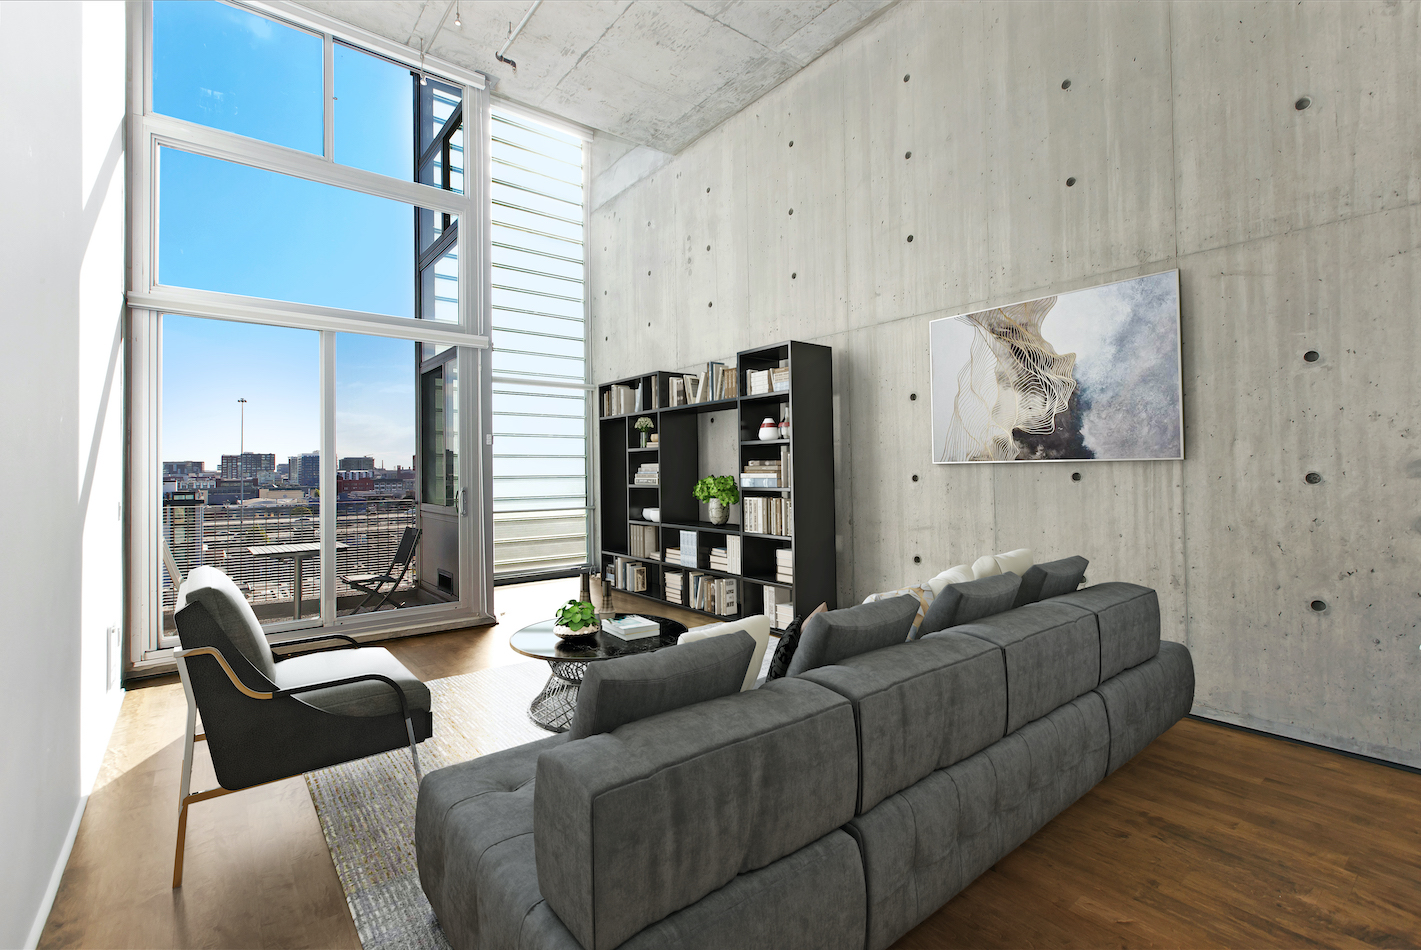 yerba buena lofts penthouse 903!